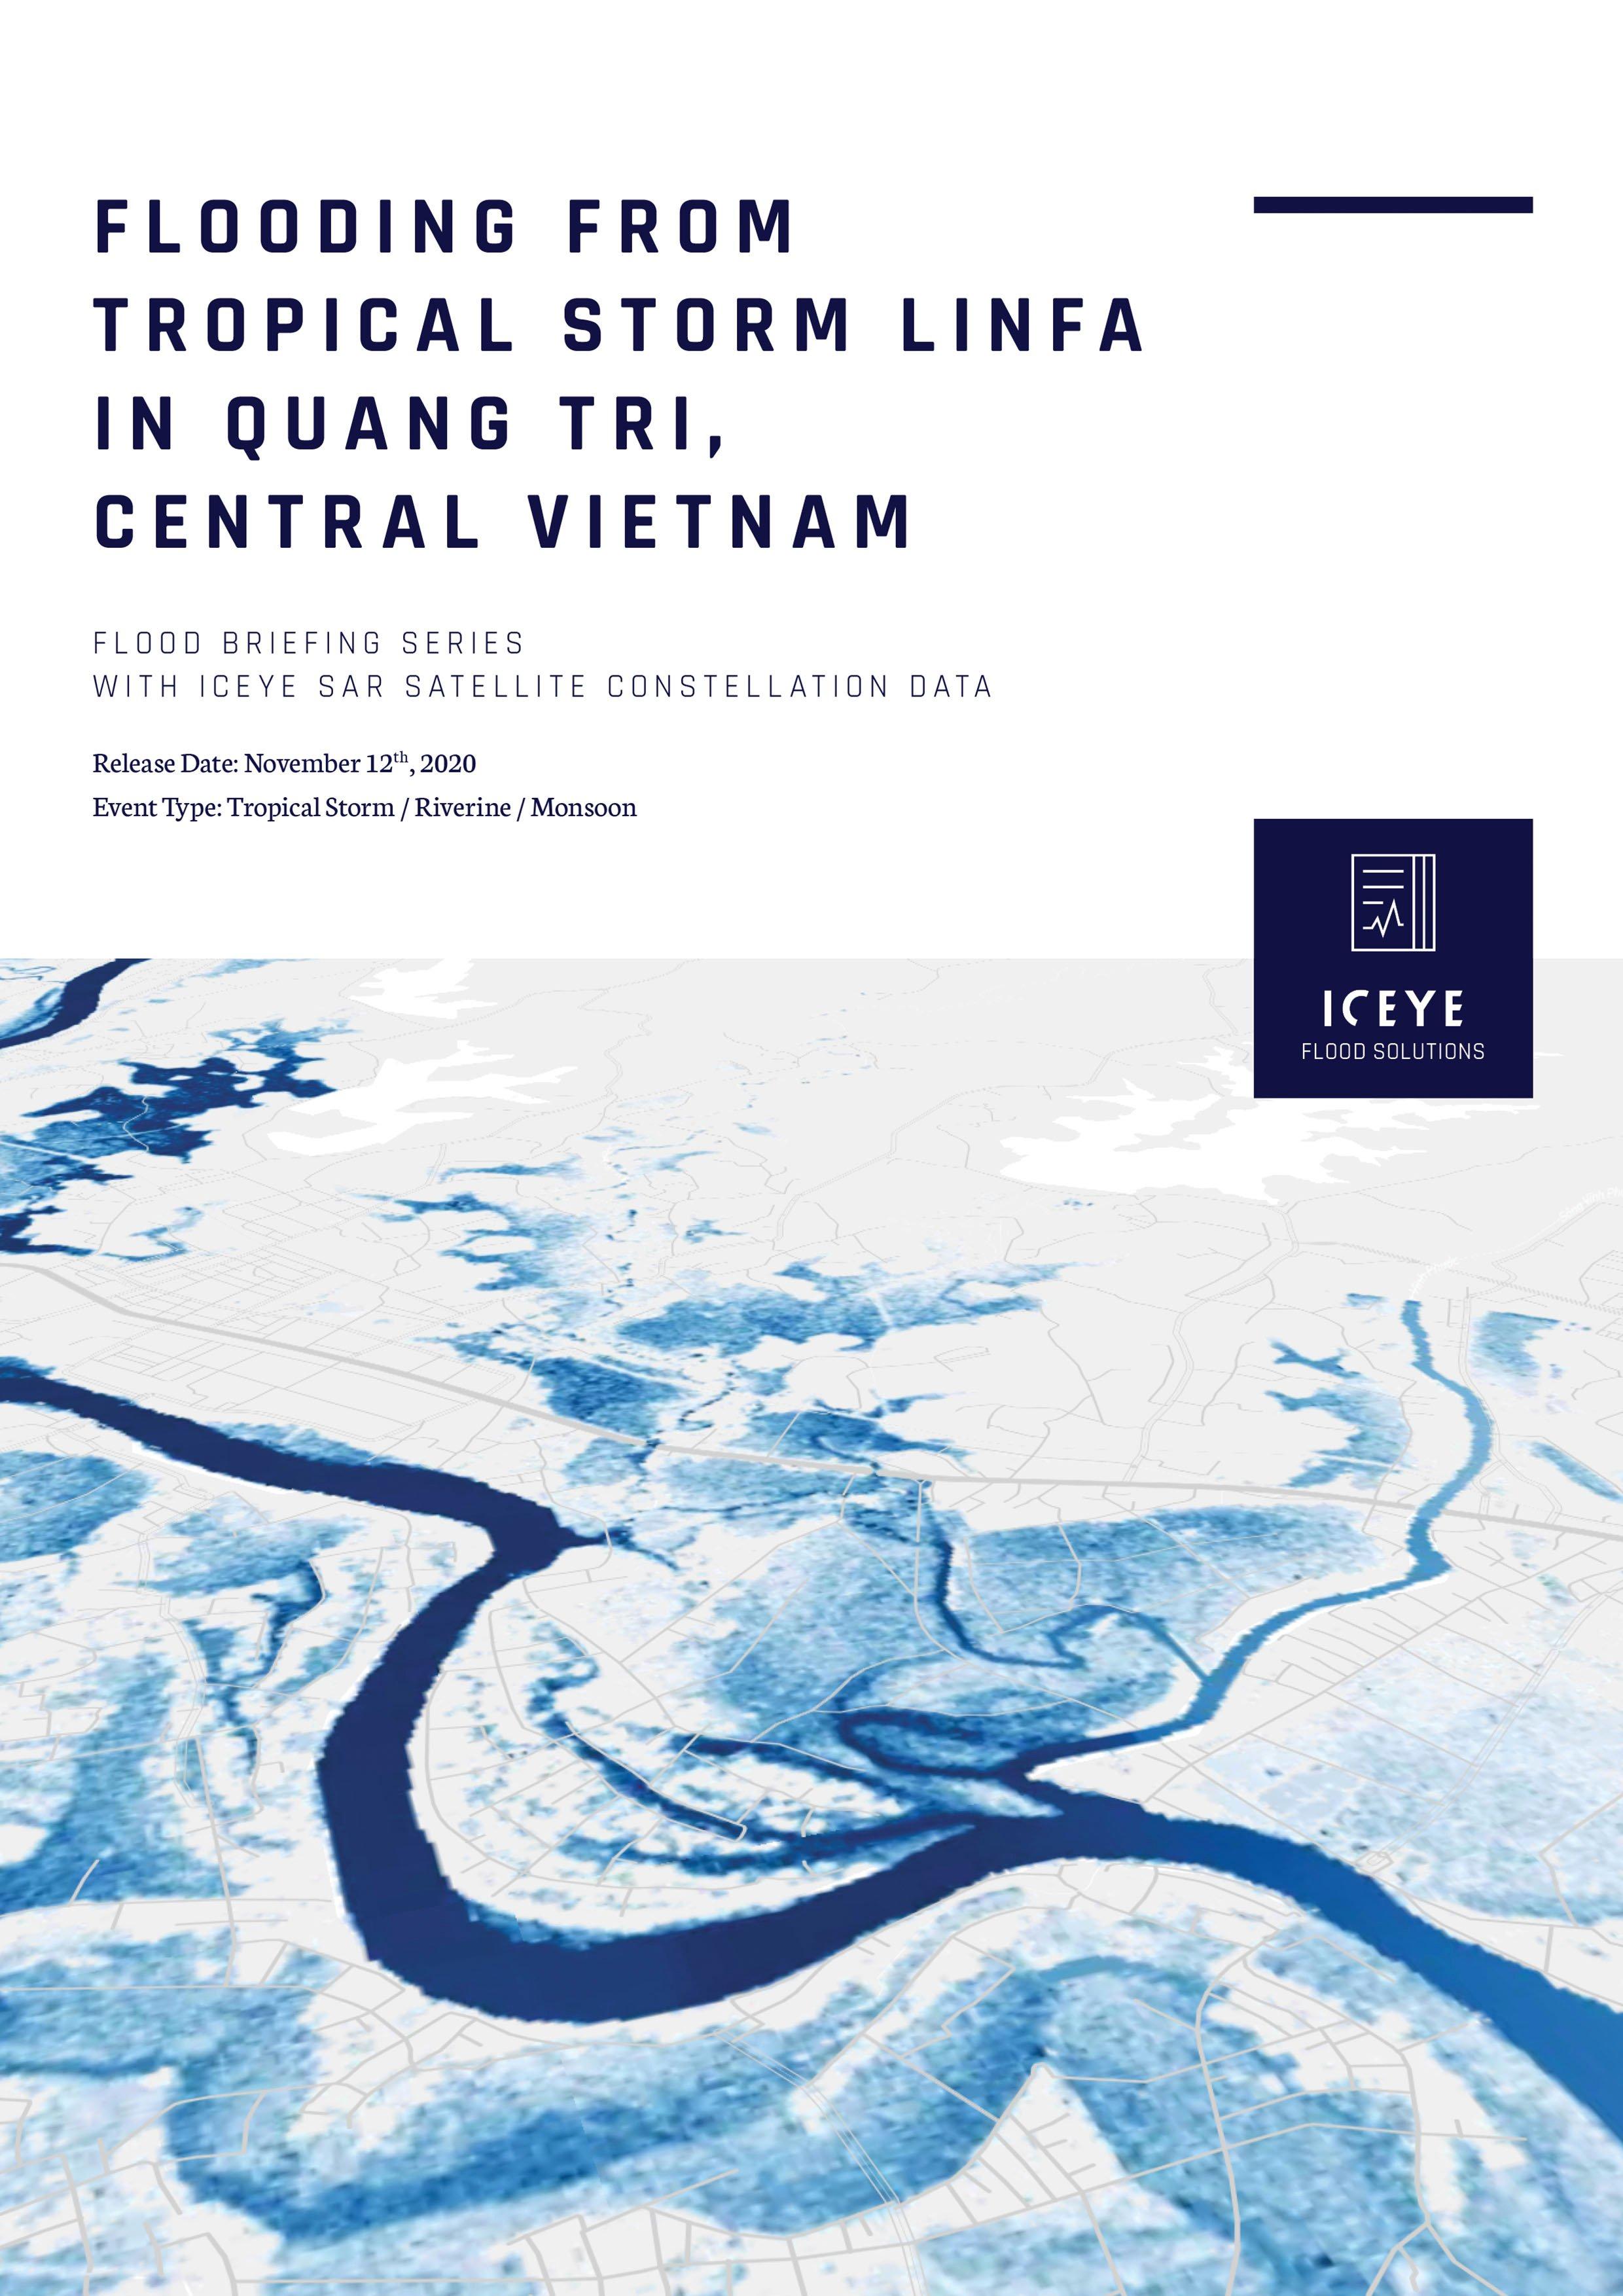 ICEYE_Flood_Briefing_Tropical_Storm_Linfa_Vietnam_2020